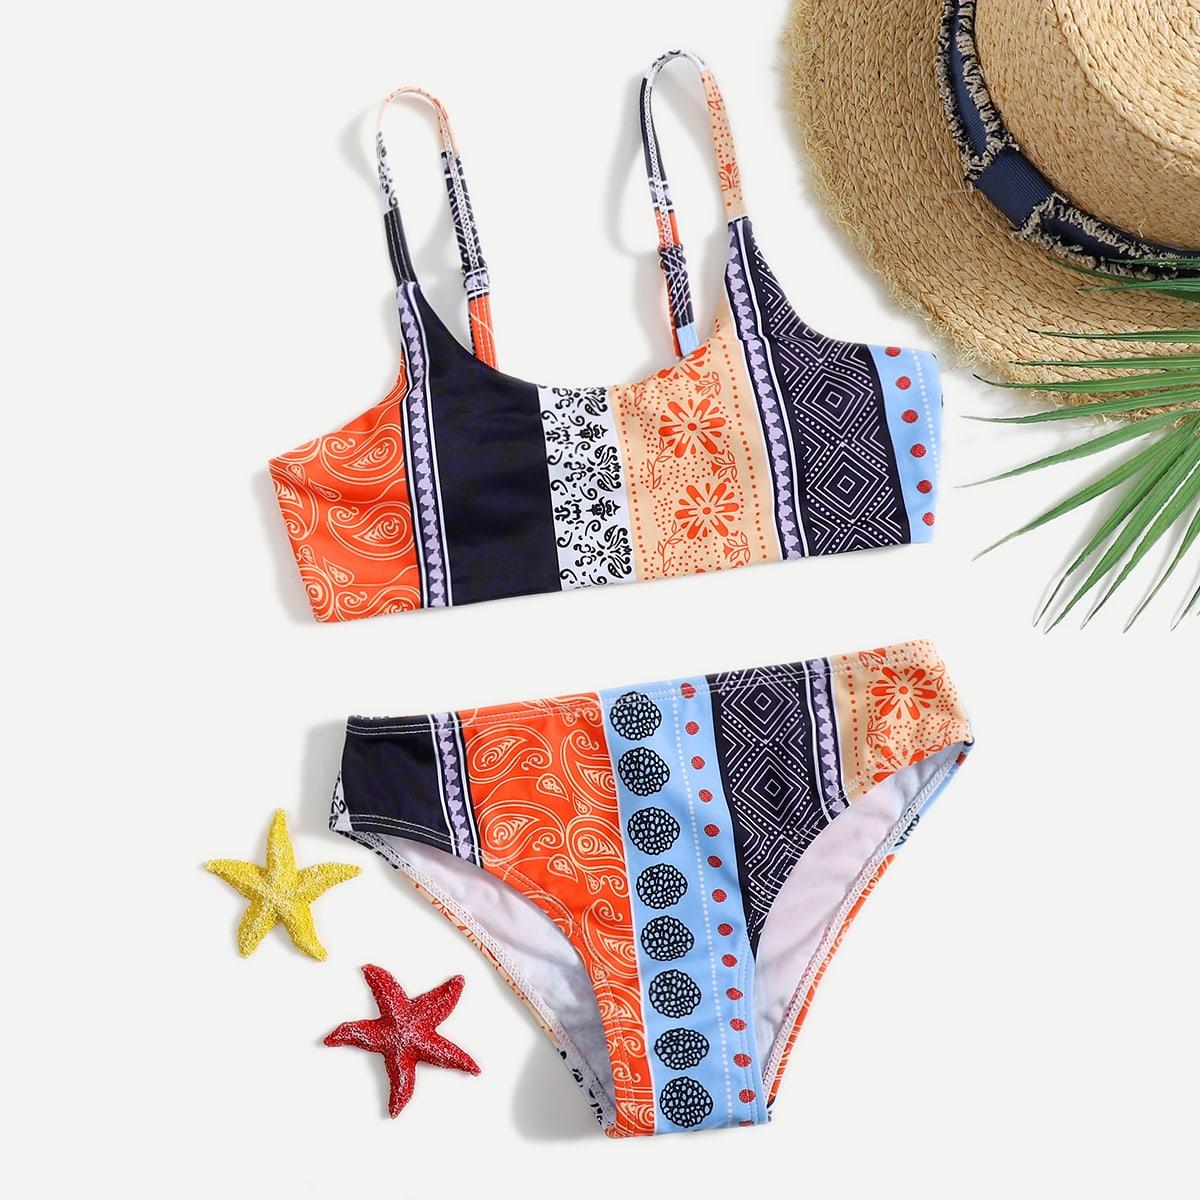 Niñas Bañador bikini con estampado geométrico con paisley